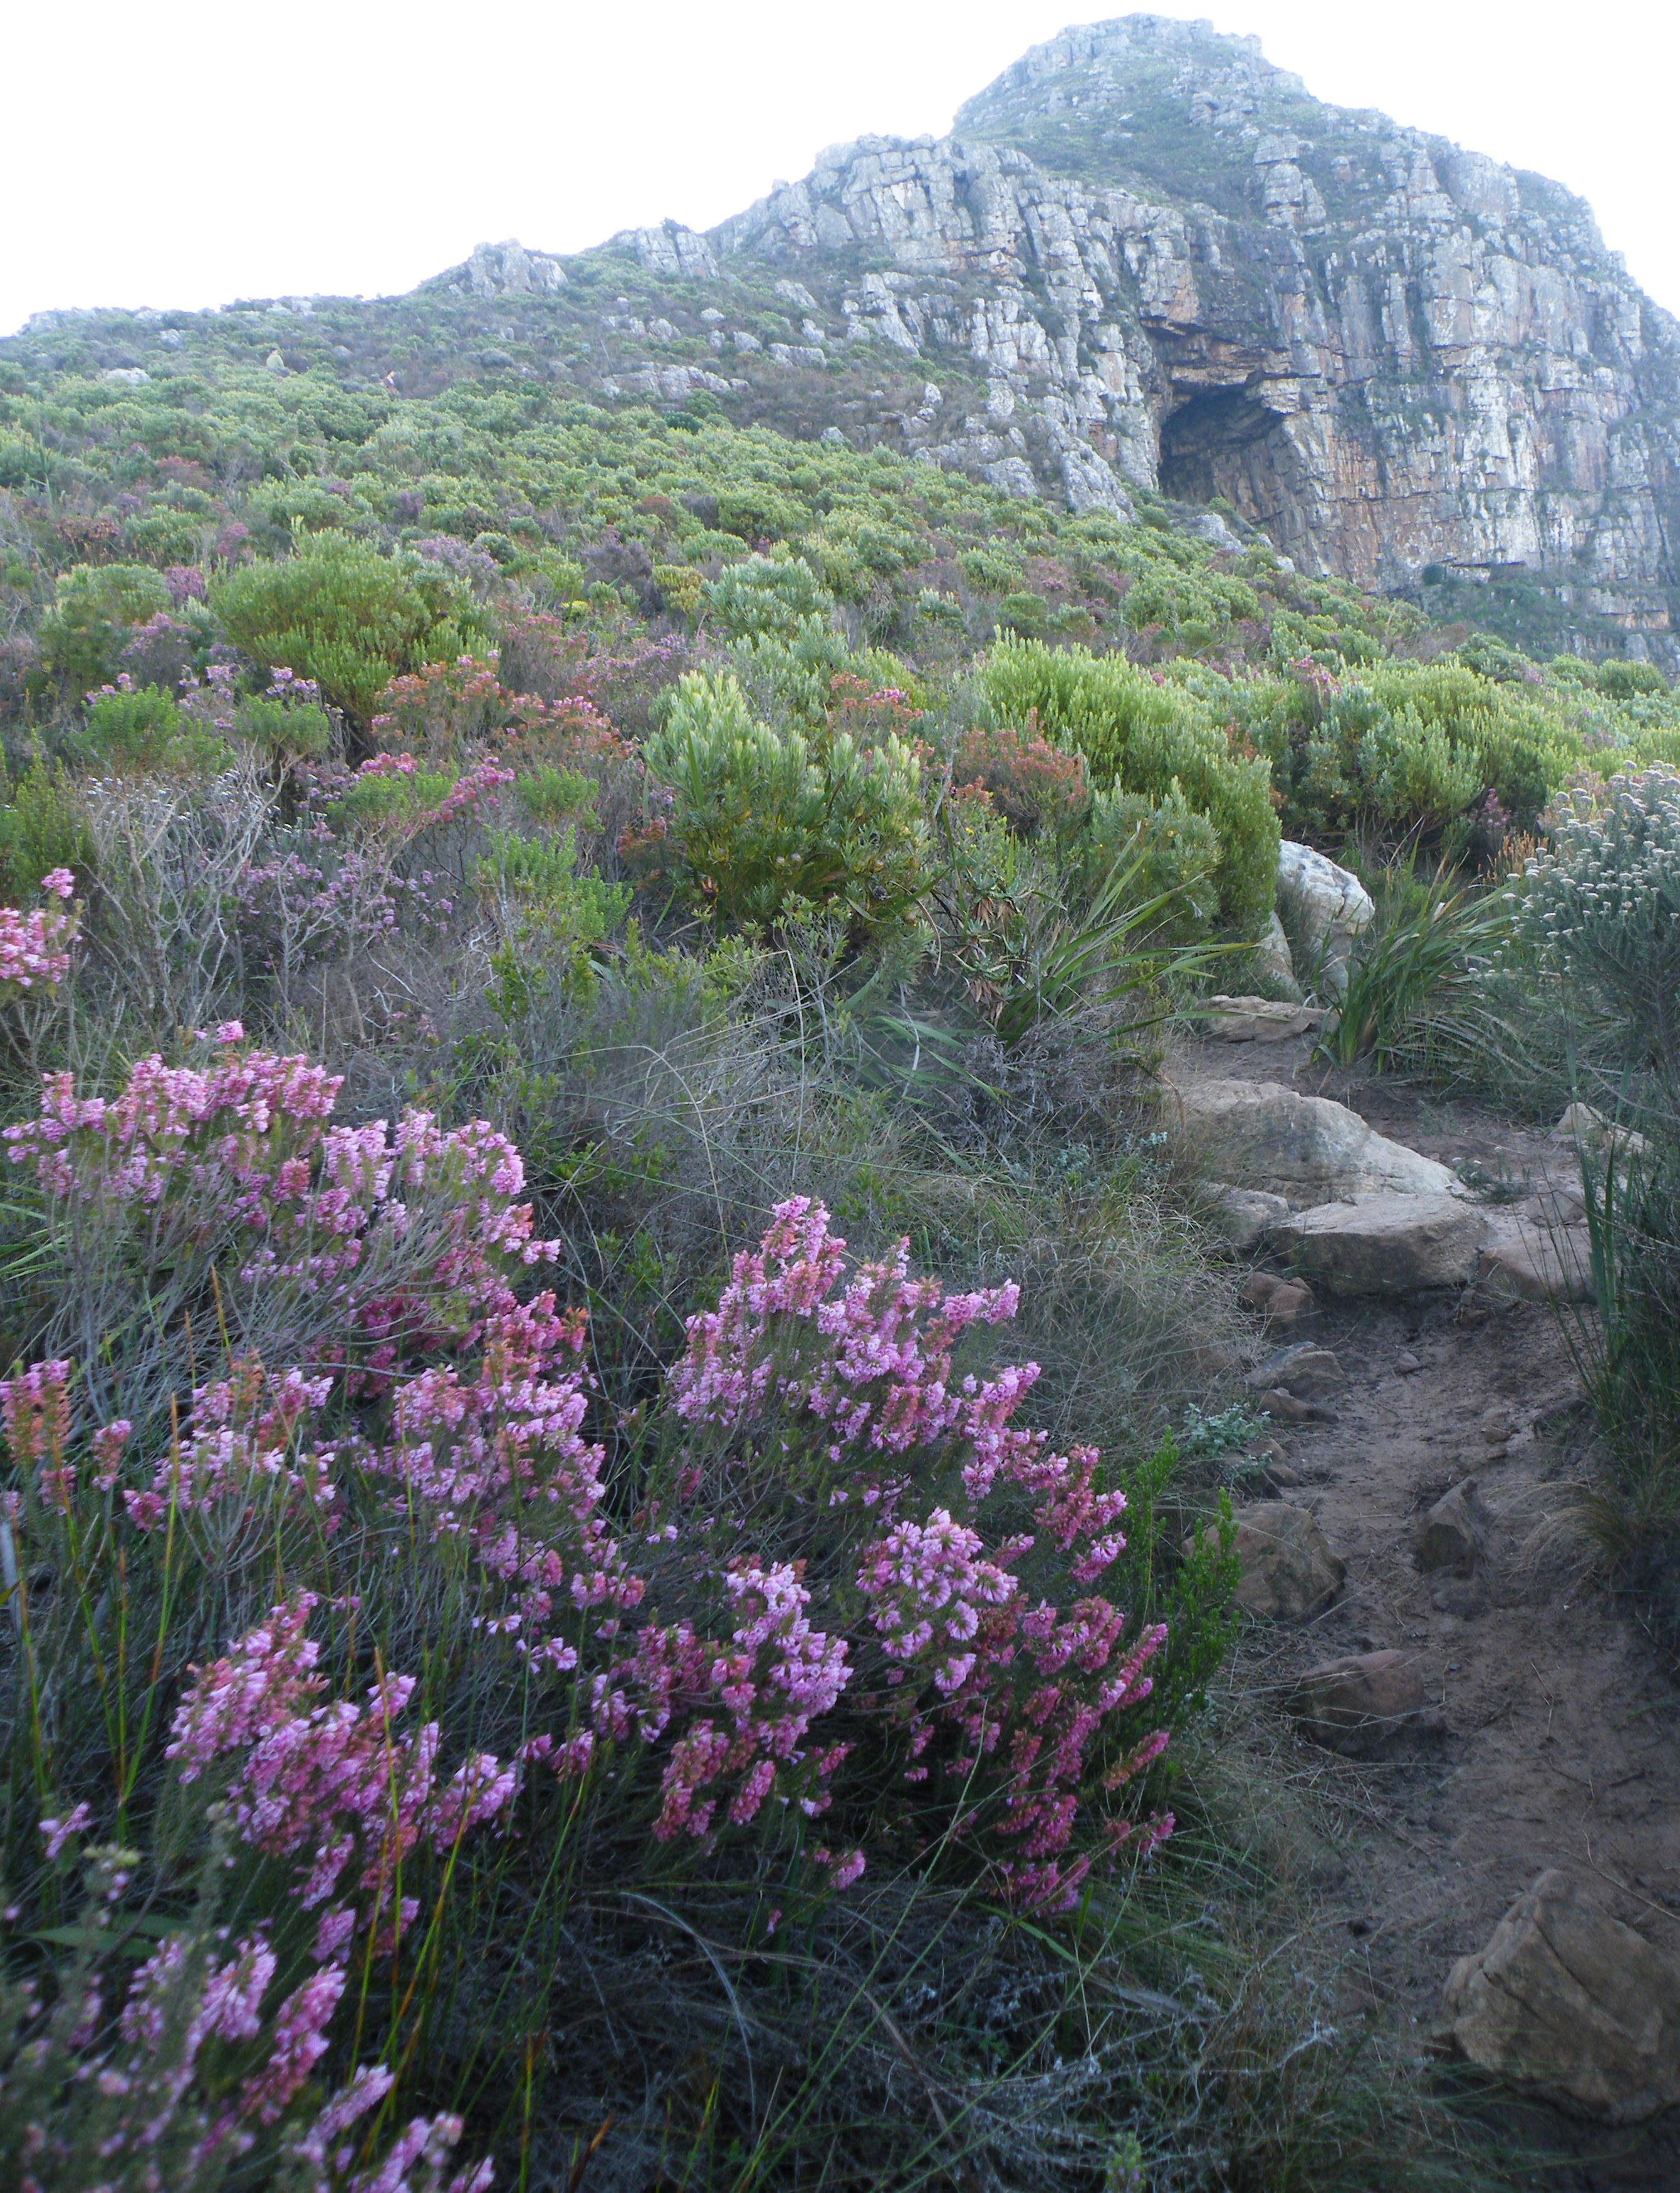 File:Olifants Oog cave Constantia Cape Town - erica fynbos.jpgconstantia town